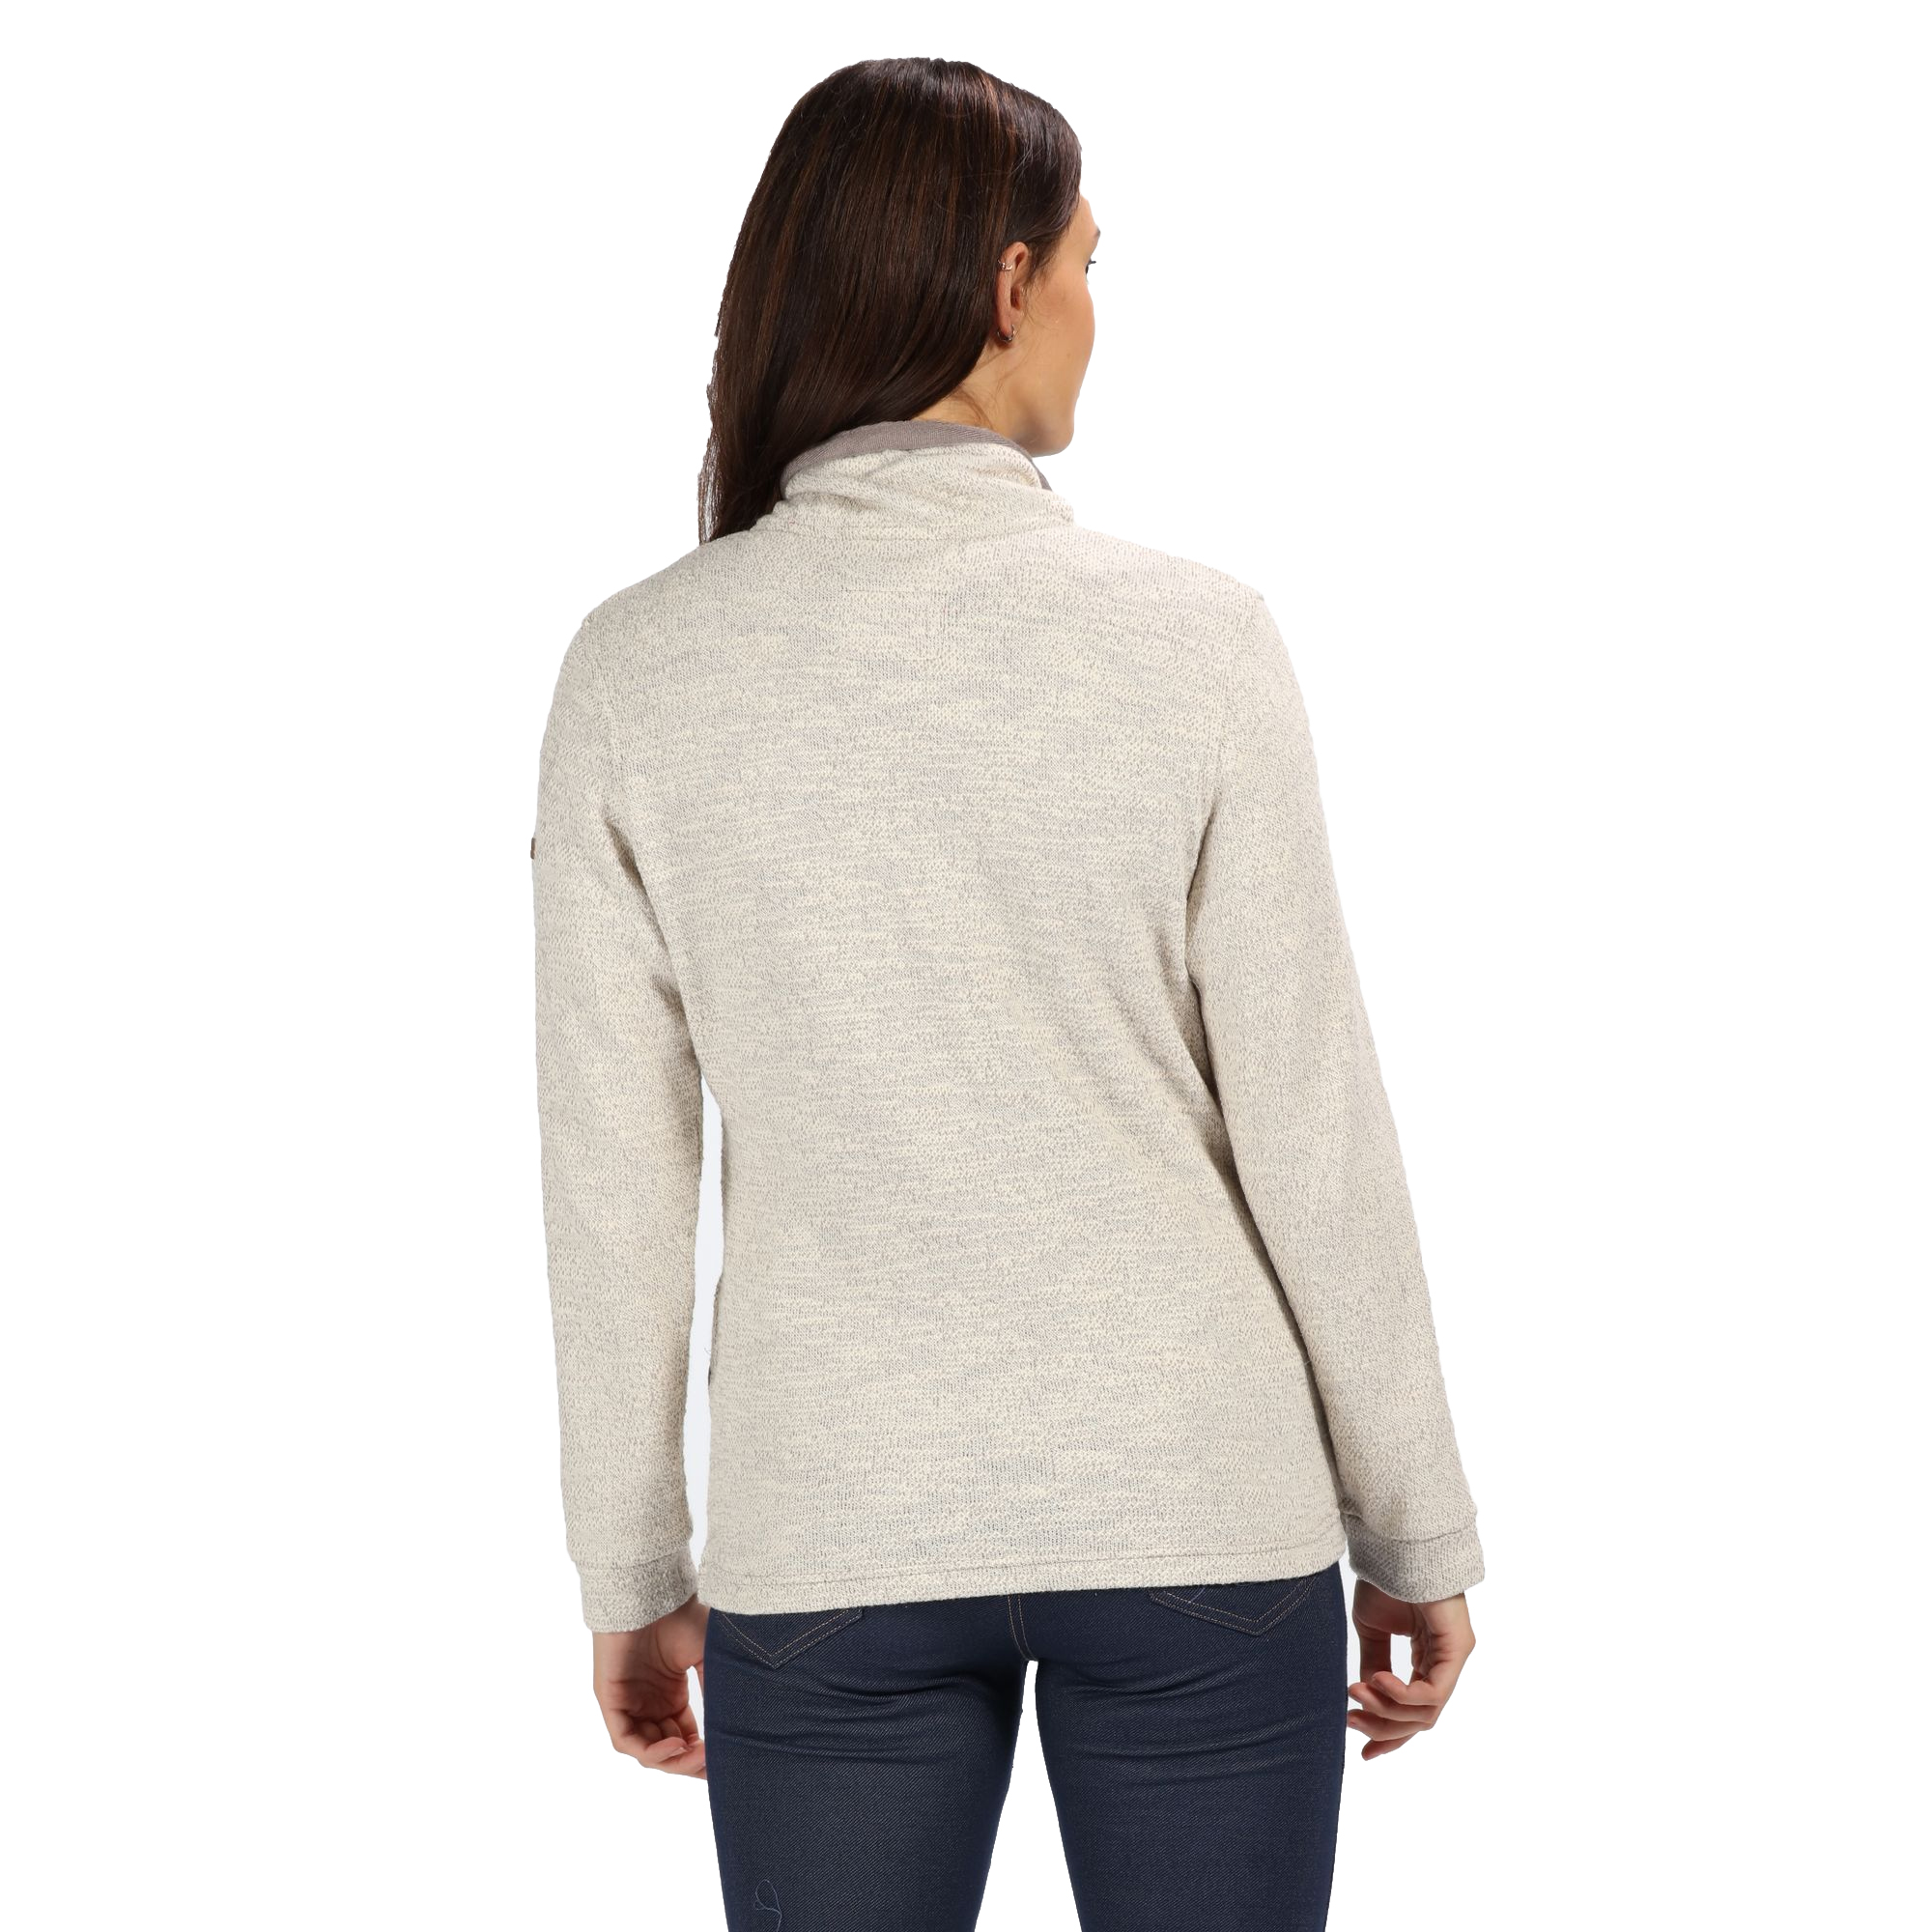 Regatta-Odetta-Womens-Warm-Curved-Full-Zip-Fleece-Jacket-RRP-50 thumbnail 11